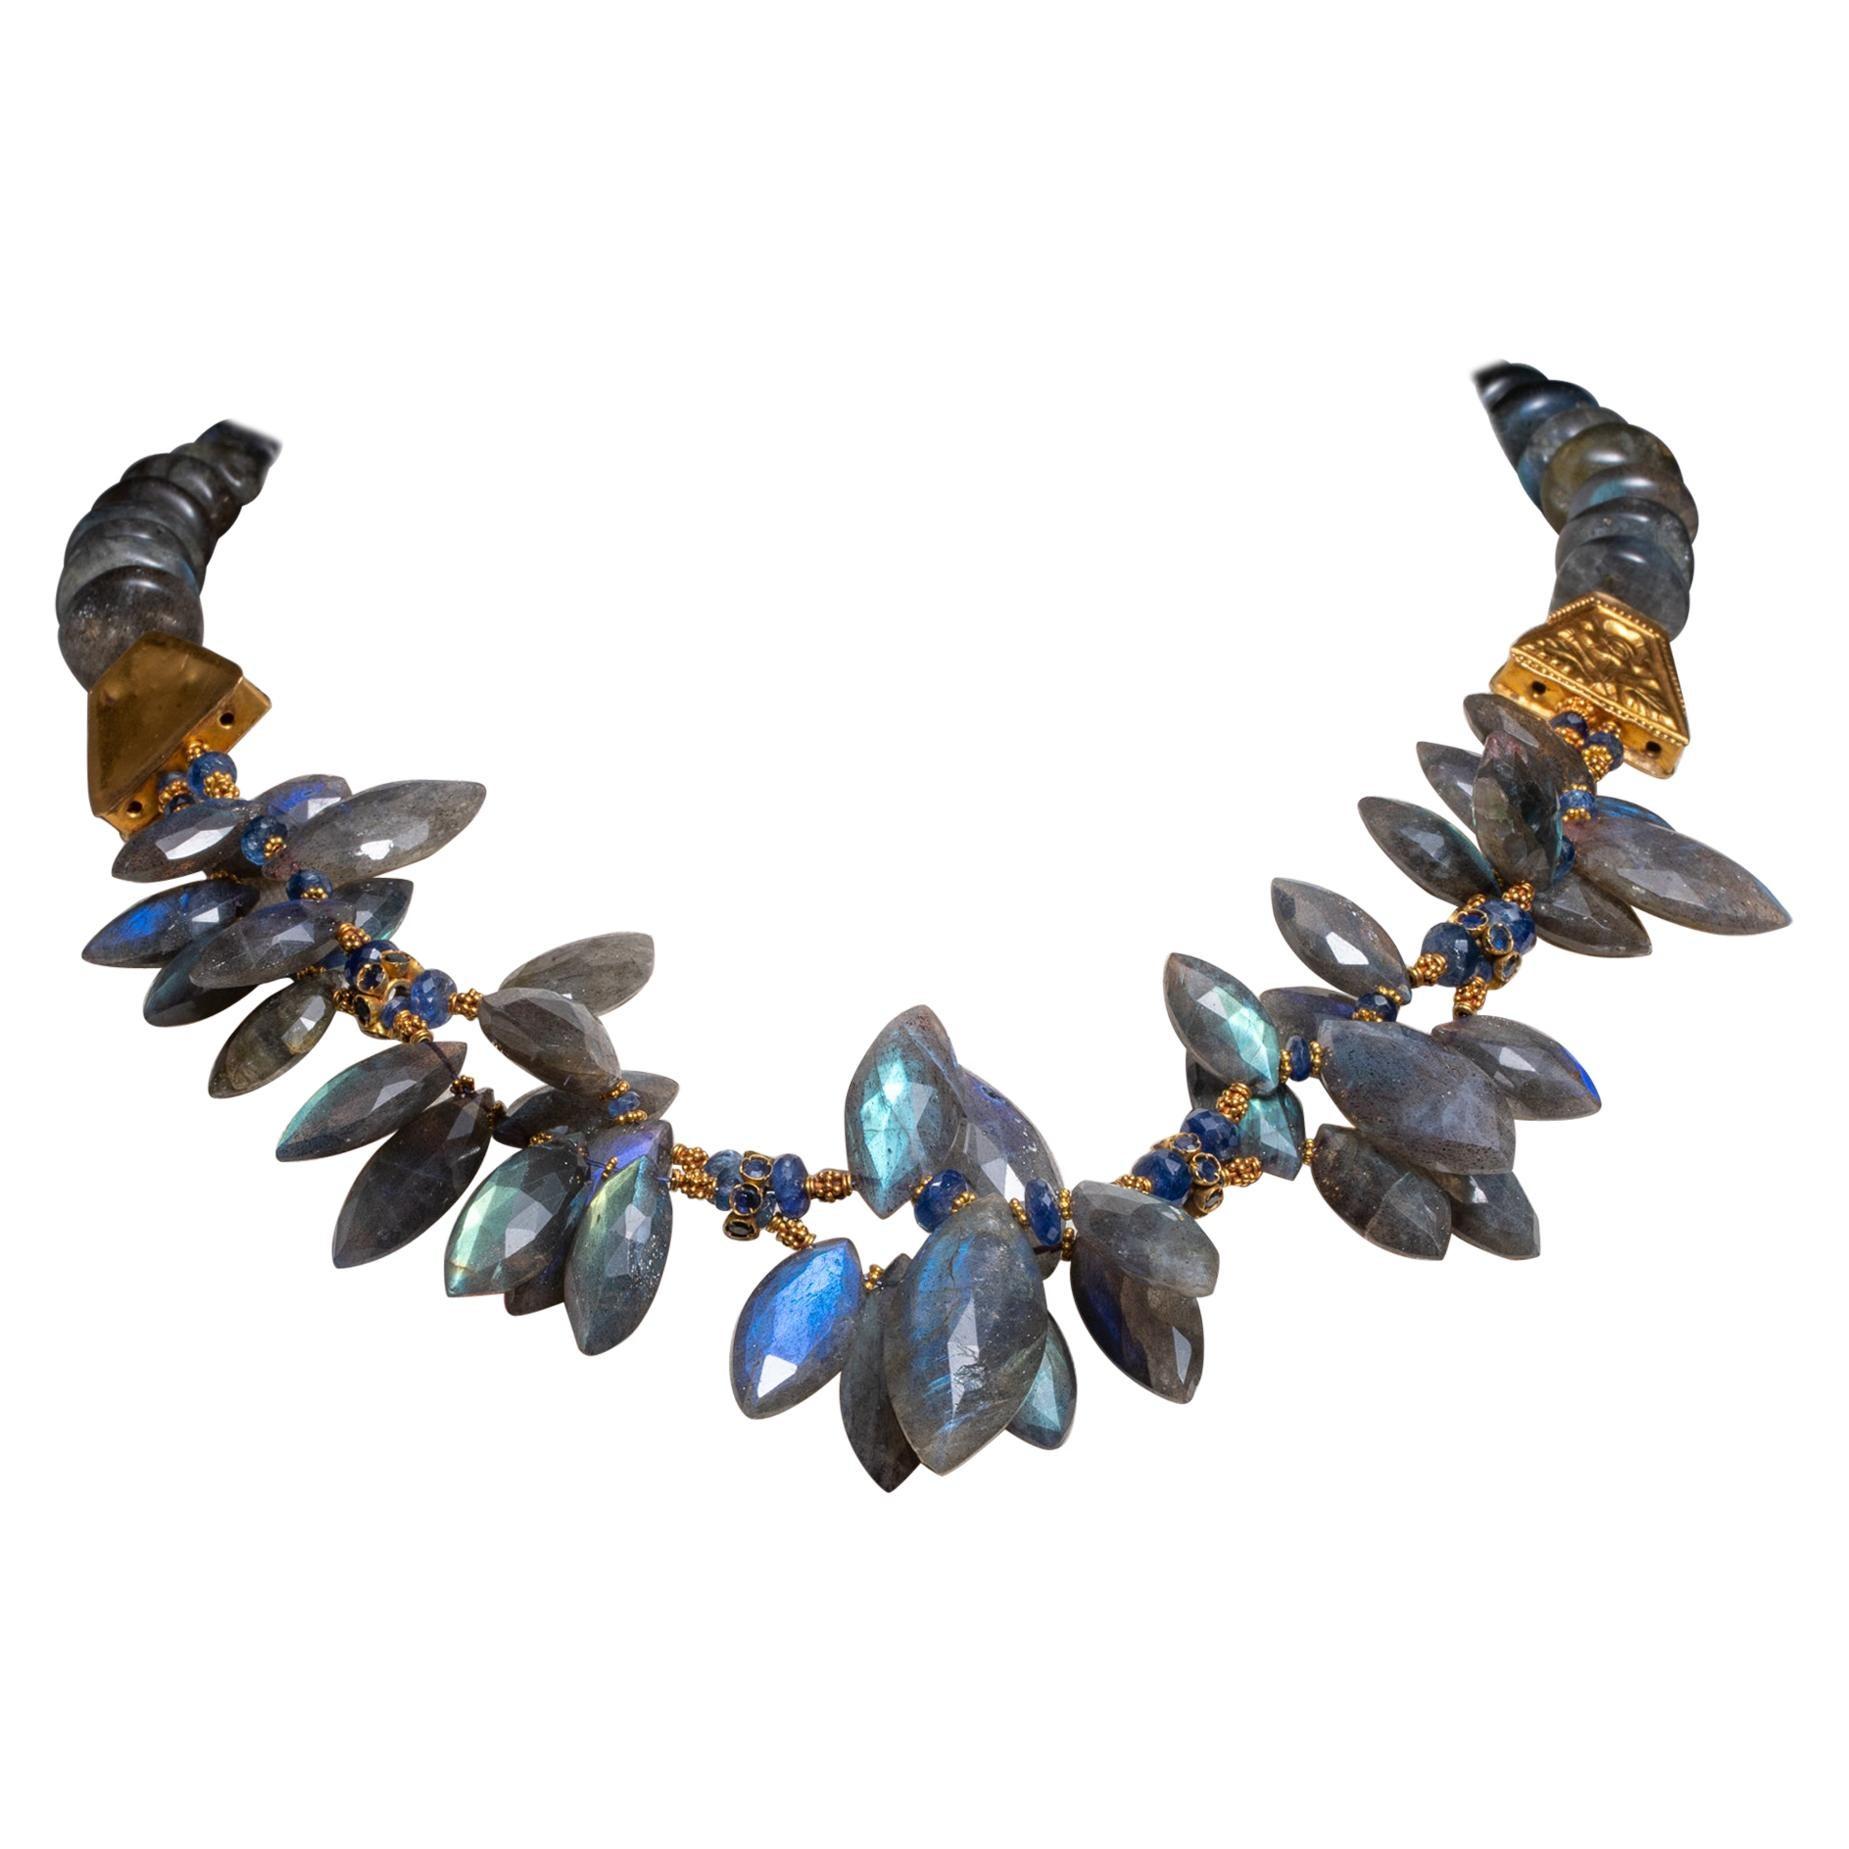 Labradorite, Blue Sapphire 22K Gold Beaded Necklace by Deborah Lockhart Phillips